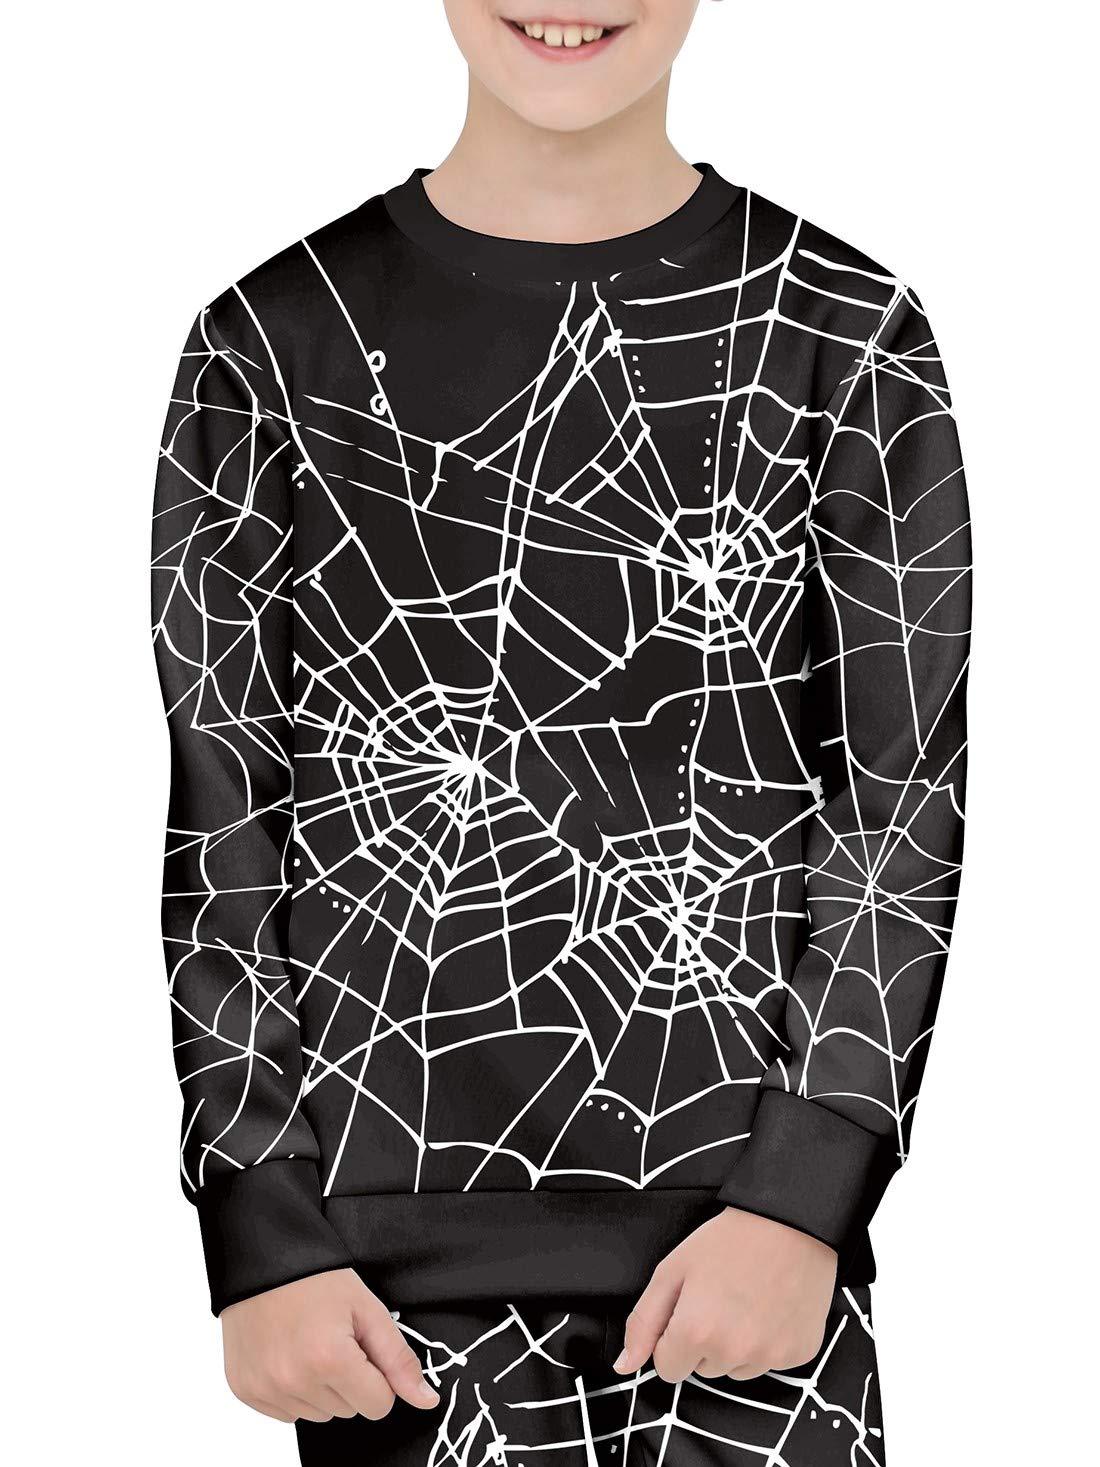 BesserBay Unisex Kid's Halloween Long Sleeve Crewneck Pullover Graphic Spider Web Printing Black Sweatershirt 2-4T